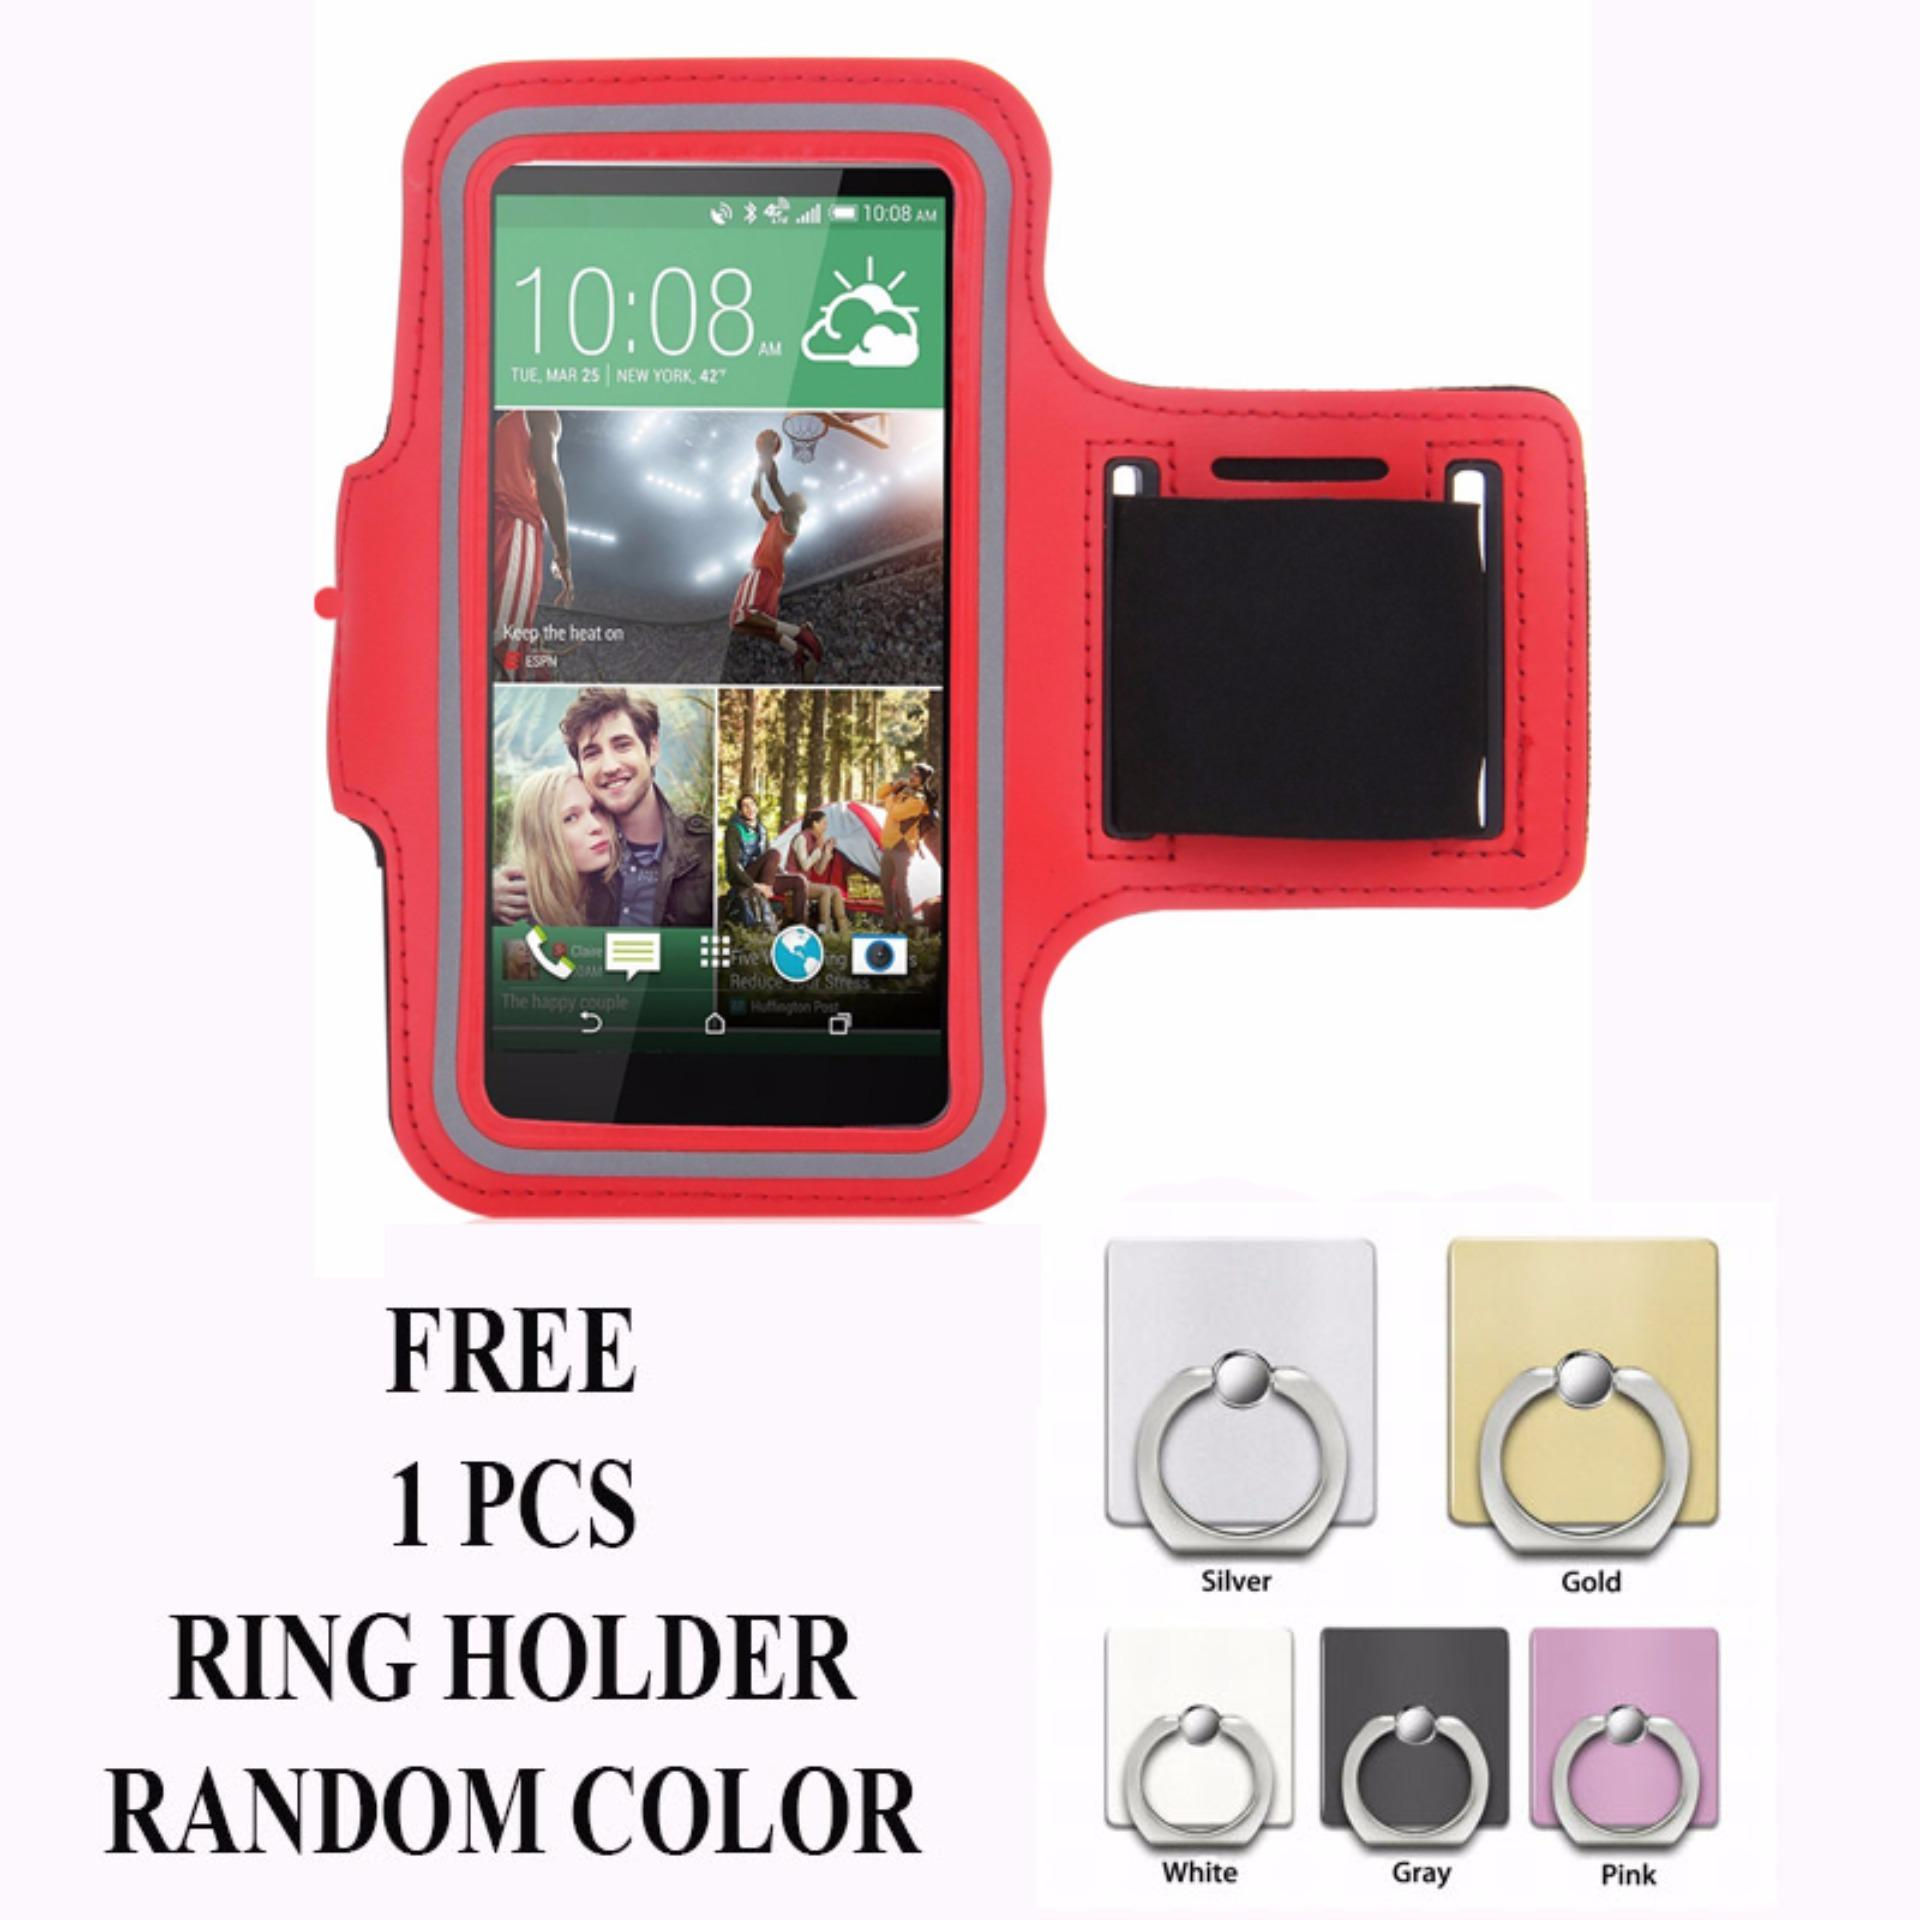 Jual Armband Untuk Samsung Galaxy J2 Prime Free Ring Holder Merah Murah Jawa Timur